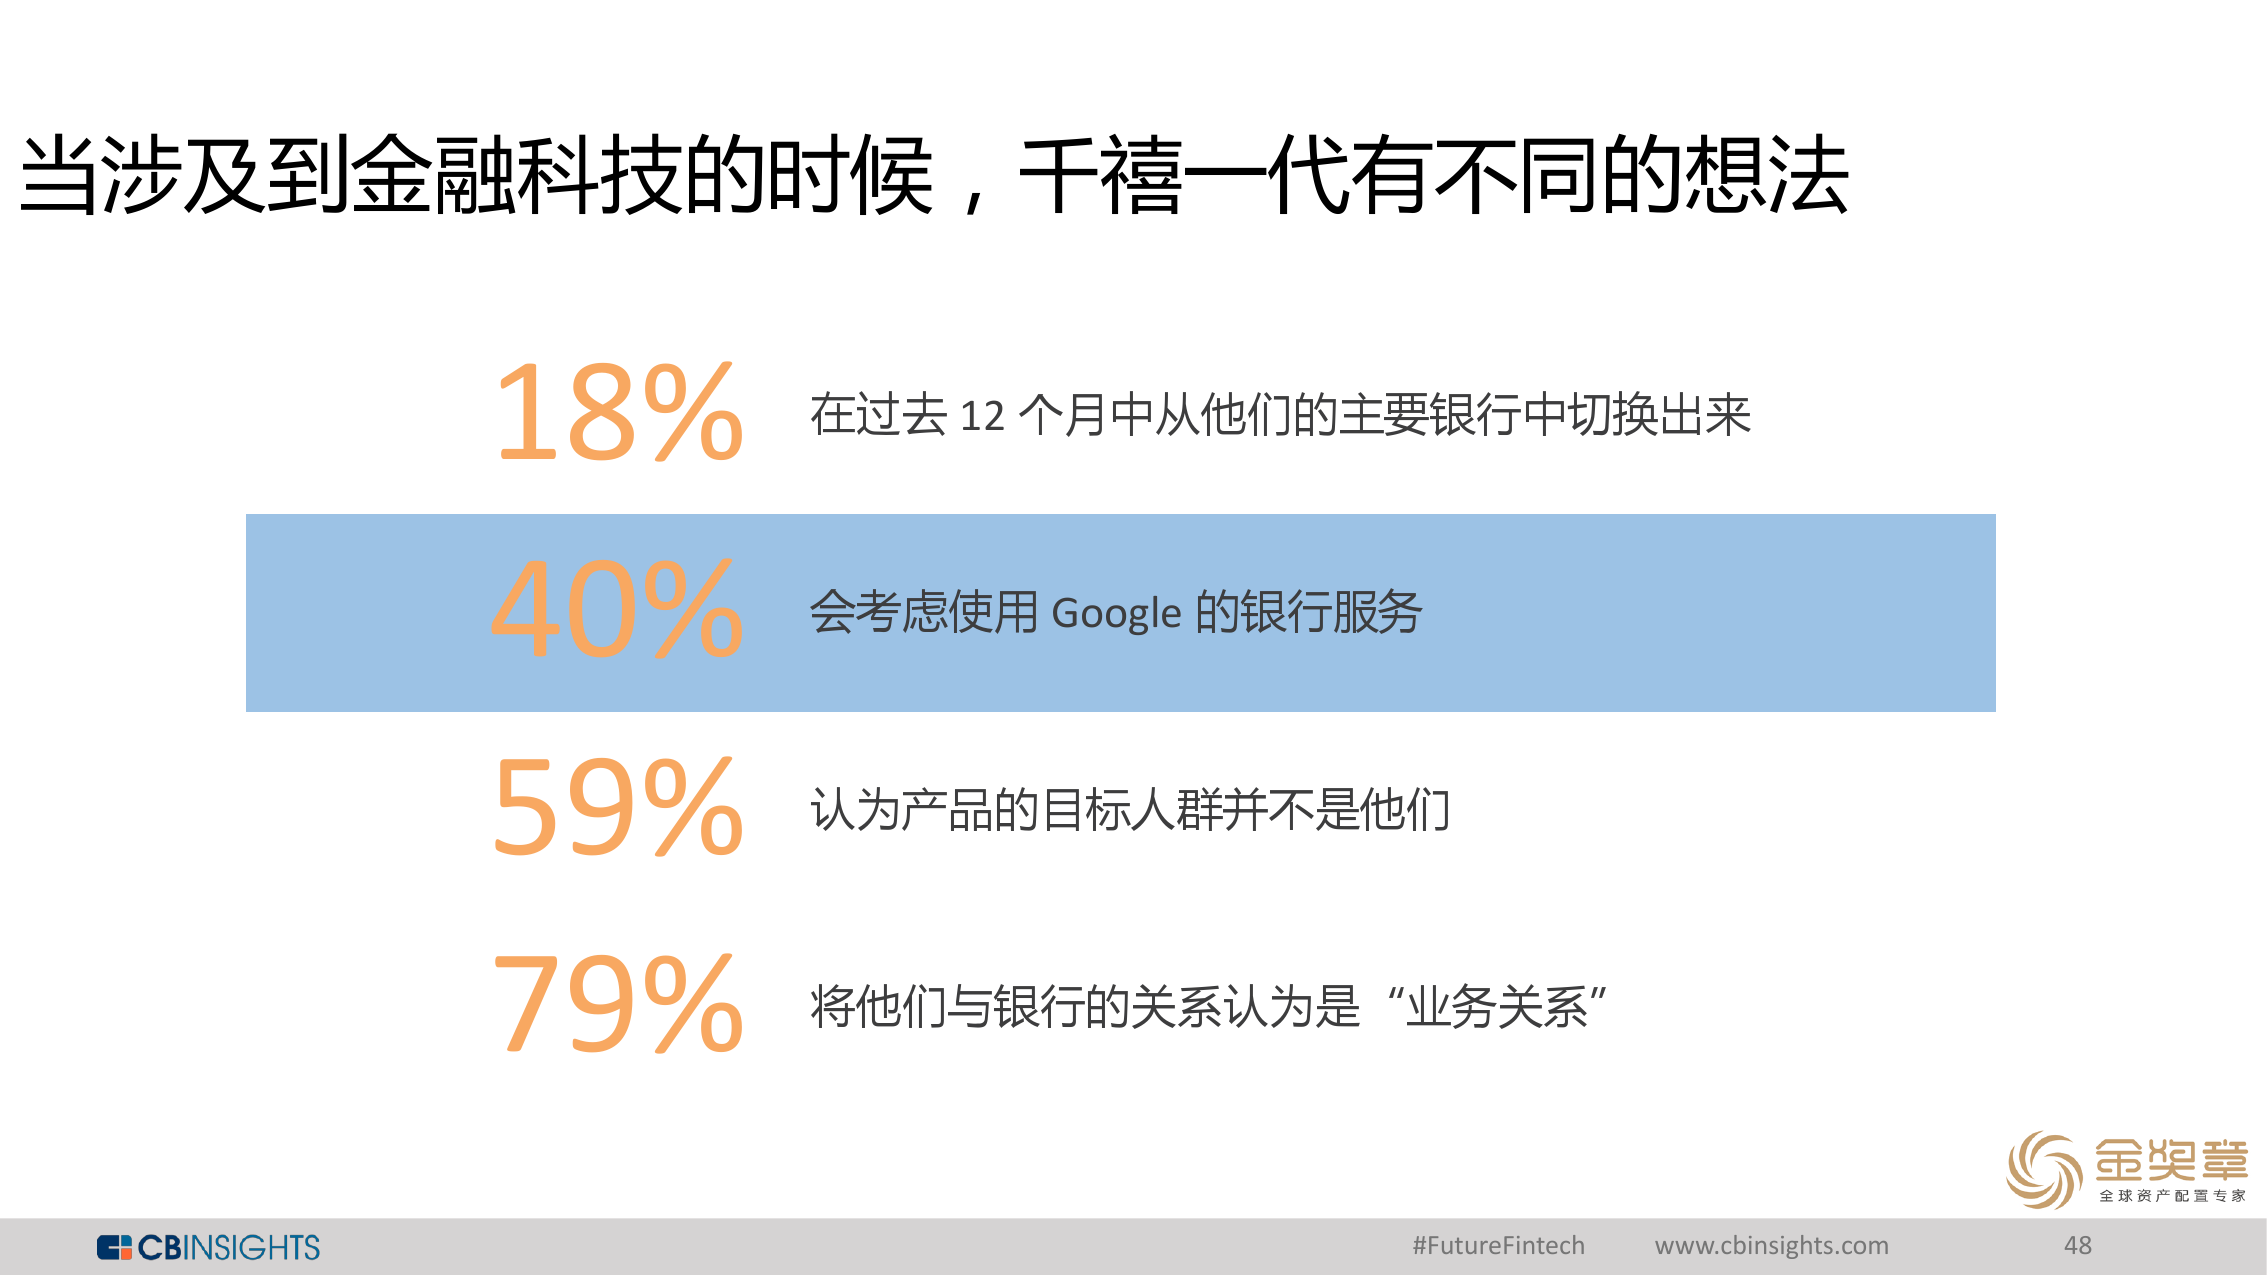 %e6%9c%aa%e6%9d%a5%e4%ba%94%e5%b9%b4%e9%87%91%e8%9e%8d%e6%9c%8d%e5%8a%a1%e8%a1%8c%e4%b8%9a%e7%9a%84%e6%a0%bc%e5%b1%80%e5%b1%95%e6%9c%9b2016_000048